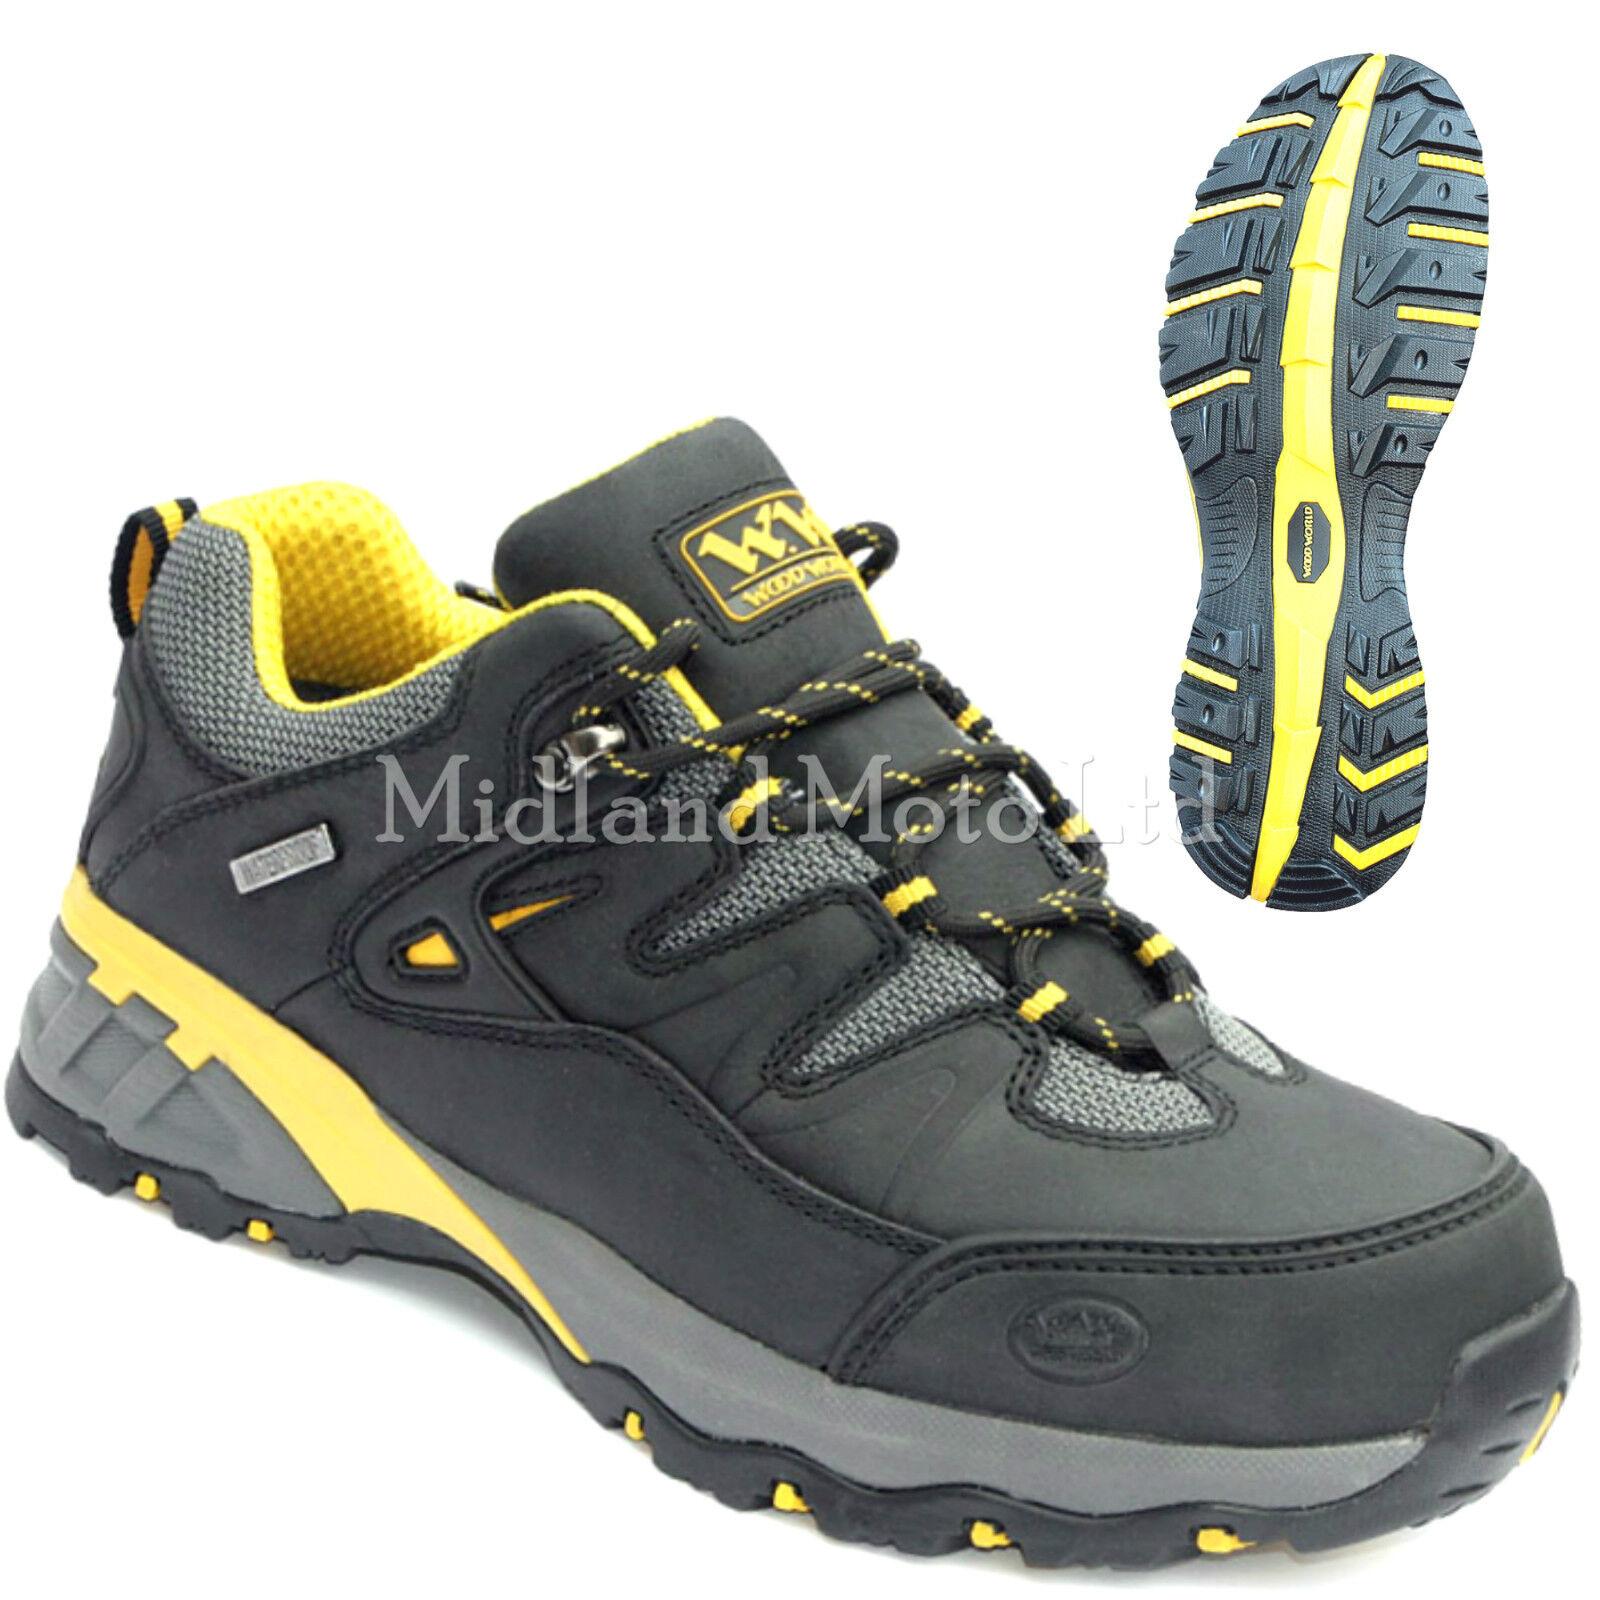 Wood World Waterproof  Steel Toe Cap Safety Trainers Size 6-14, 40-48 WW7Lo-P